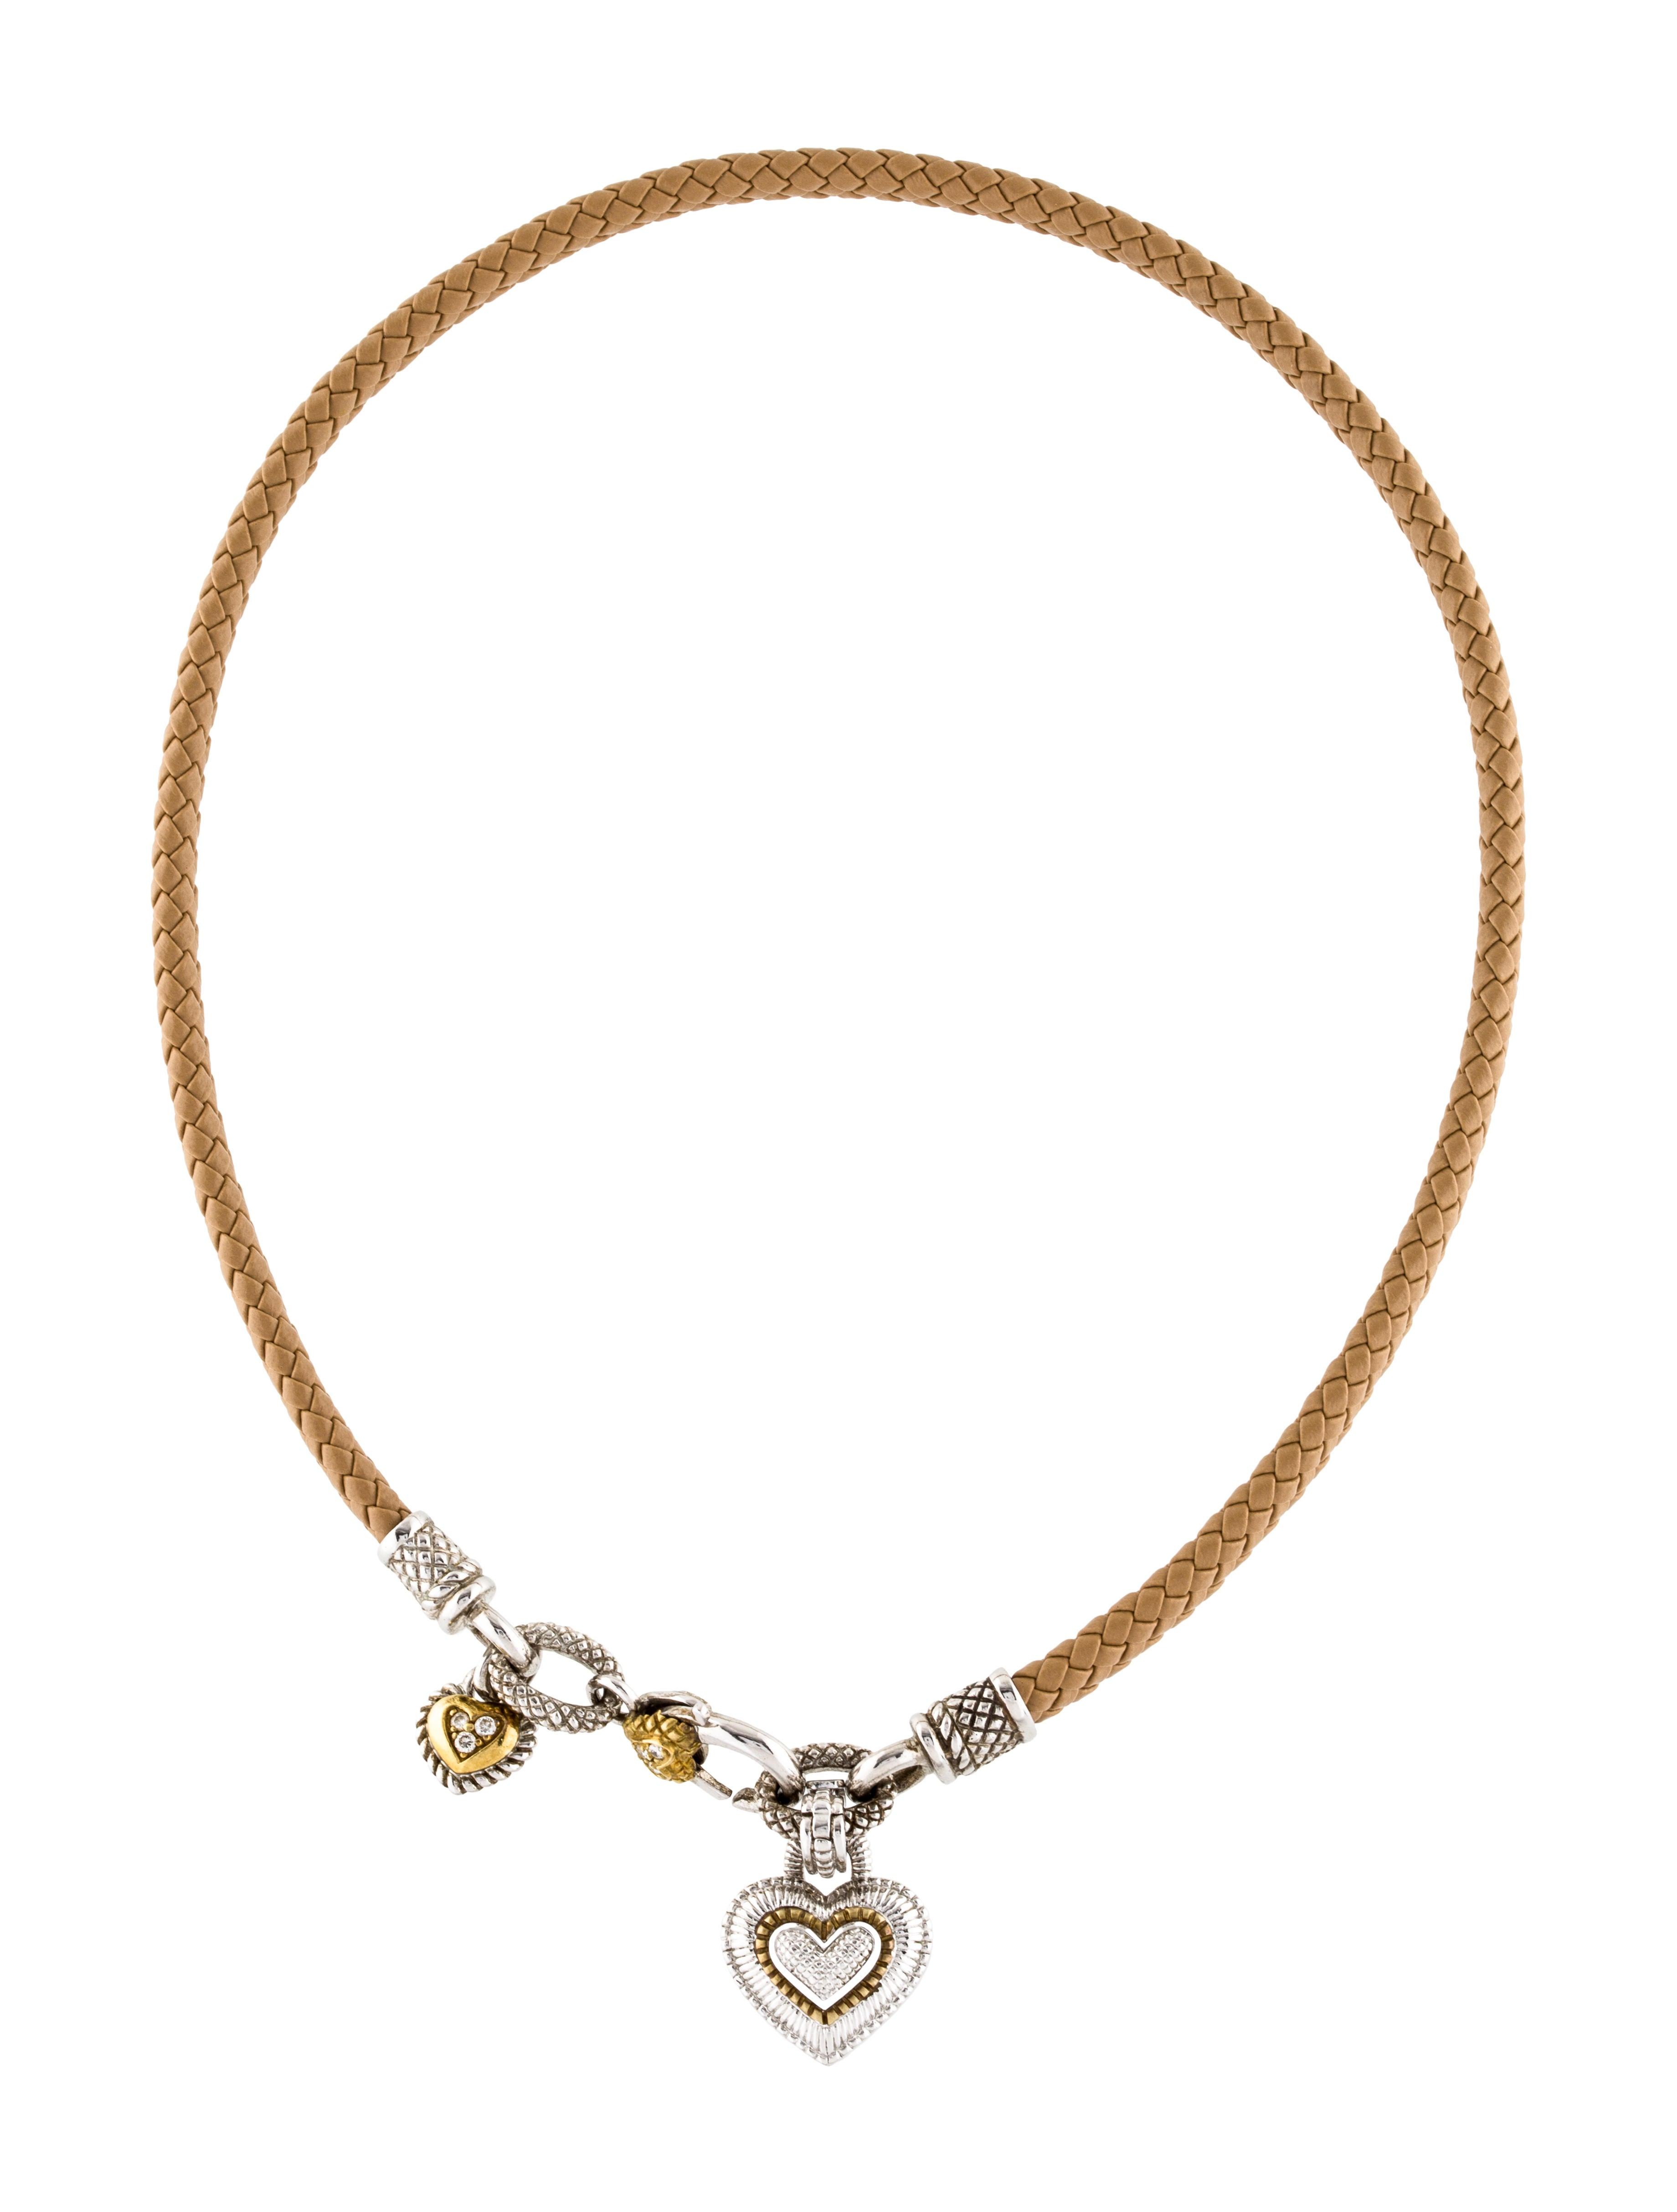 Judith ripka 18k diamond heart pendant necklace necklaces 18k diamond heart pendant necklace aloadofball Images